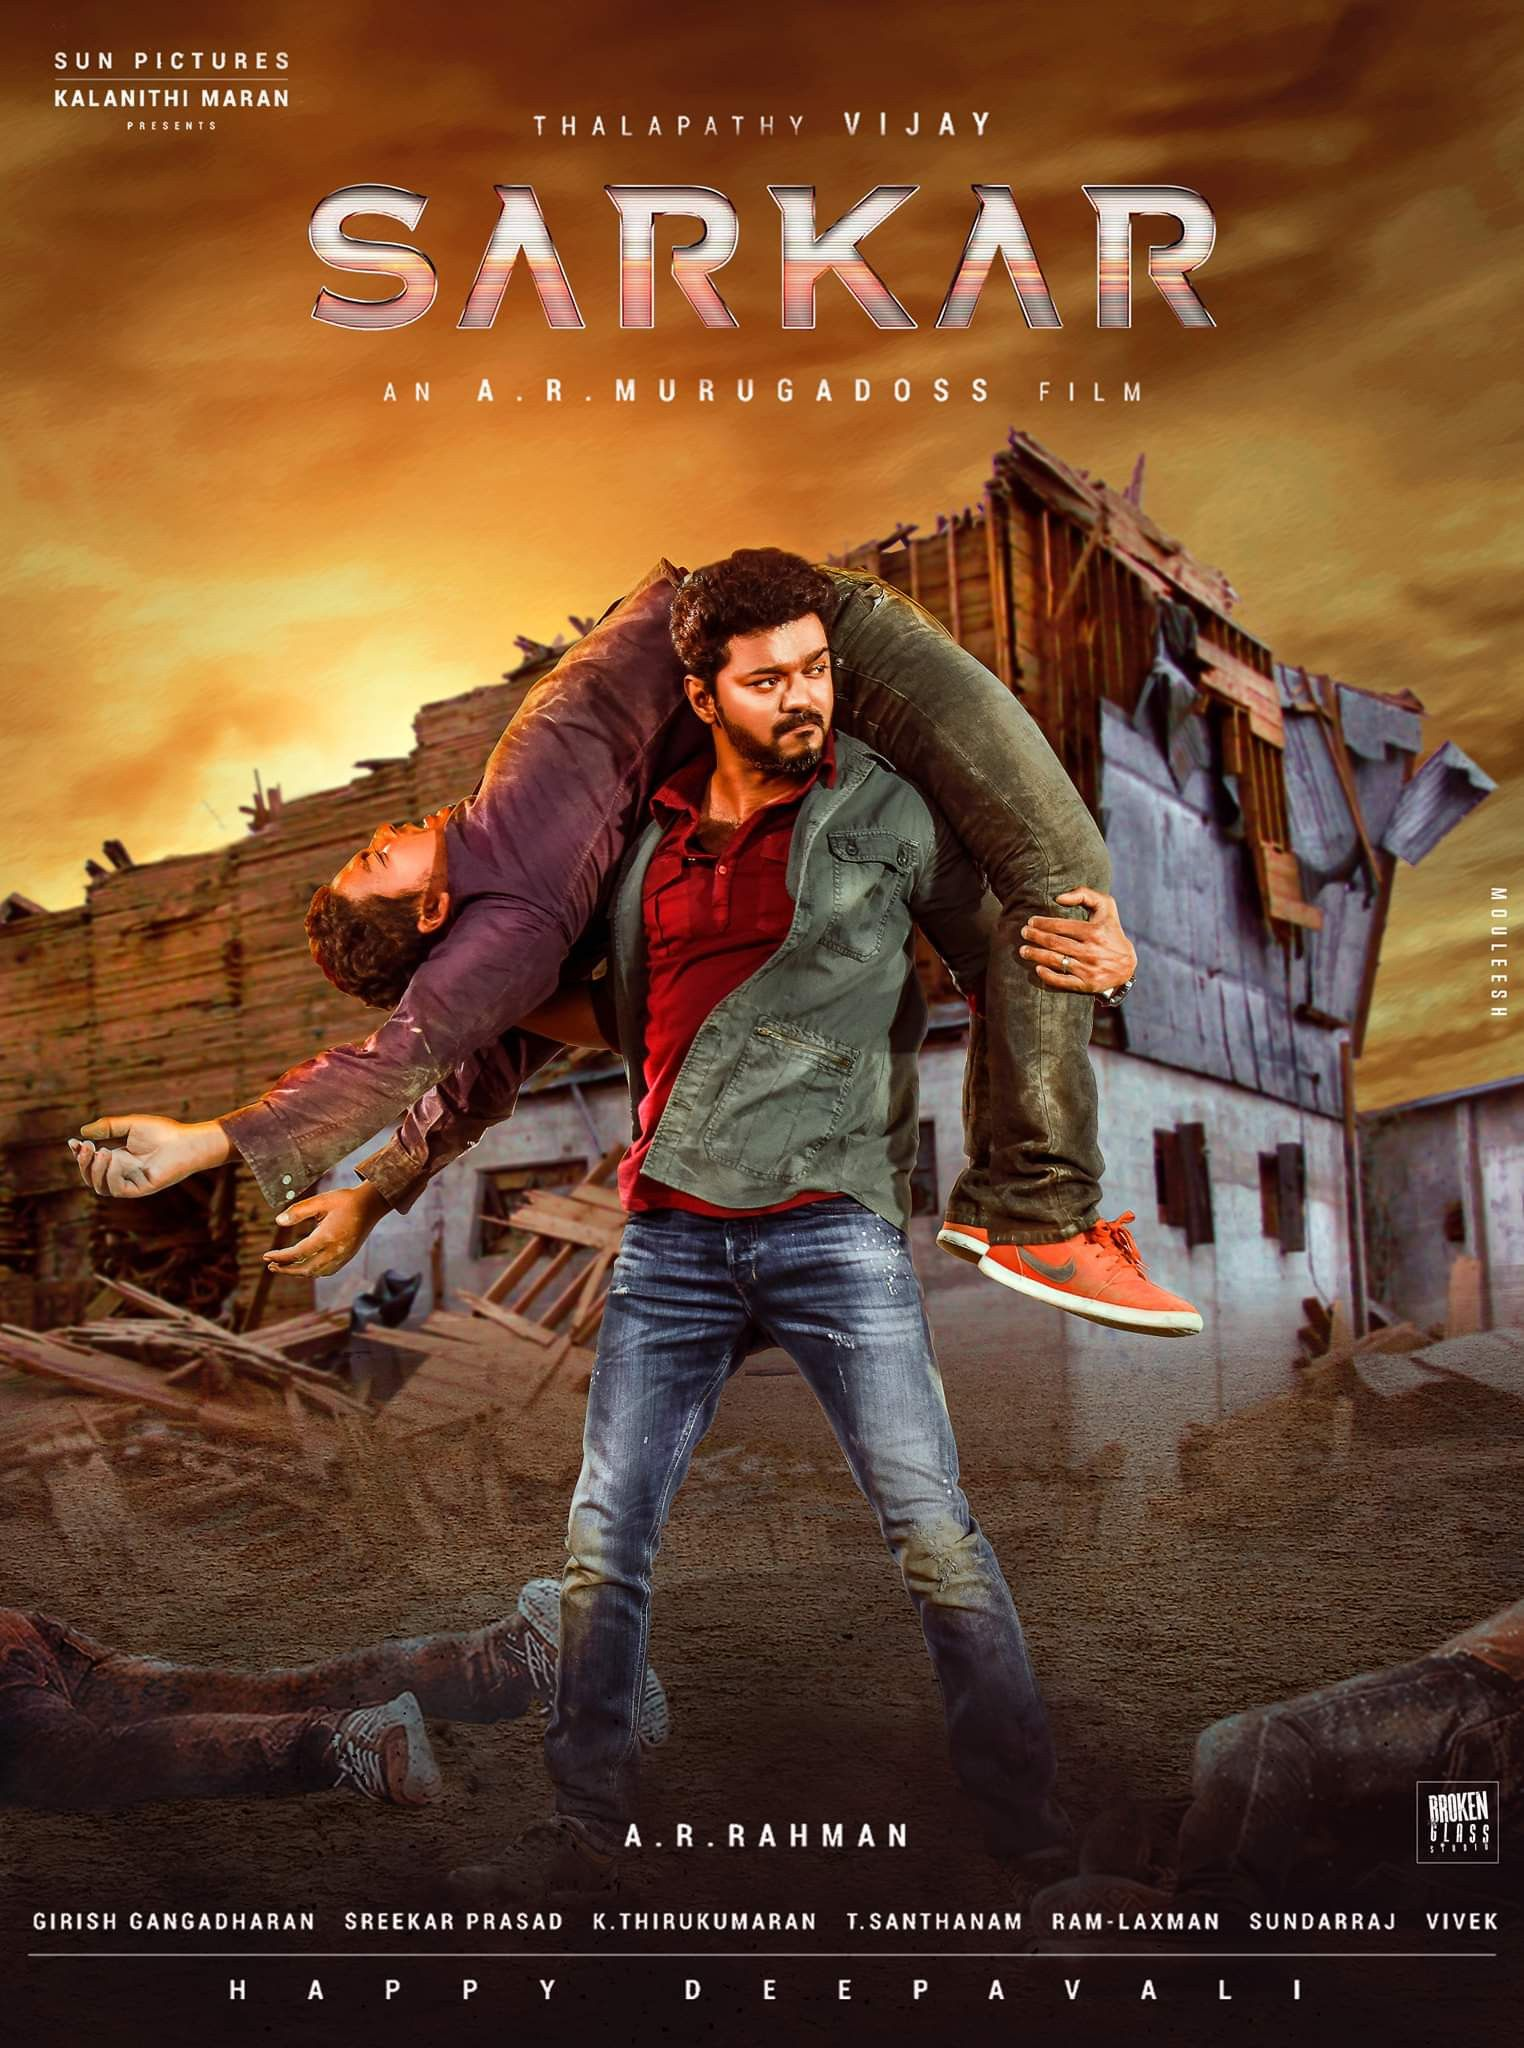 Sarkar 2018 Hindi Dubbed WEB-HDx264 ESub